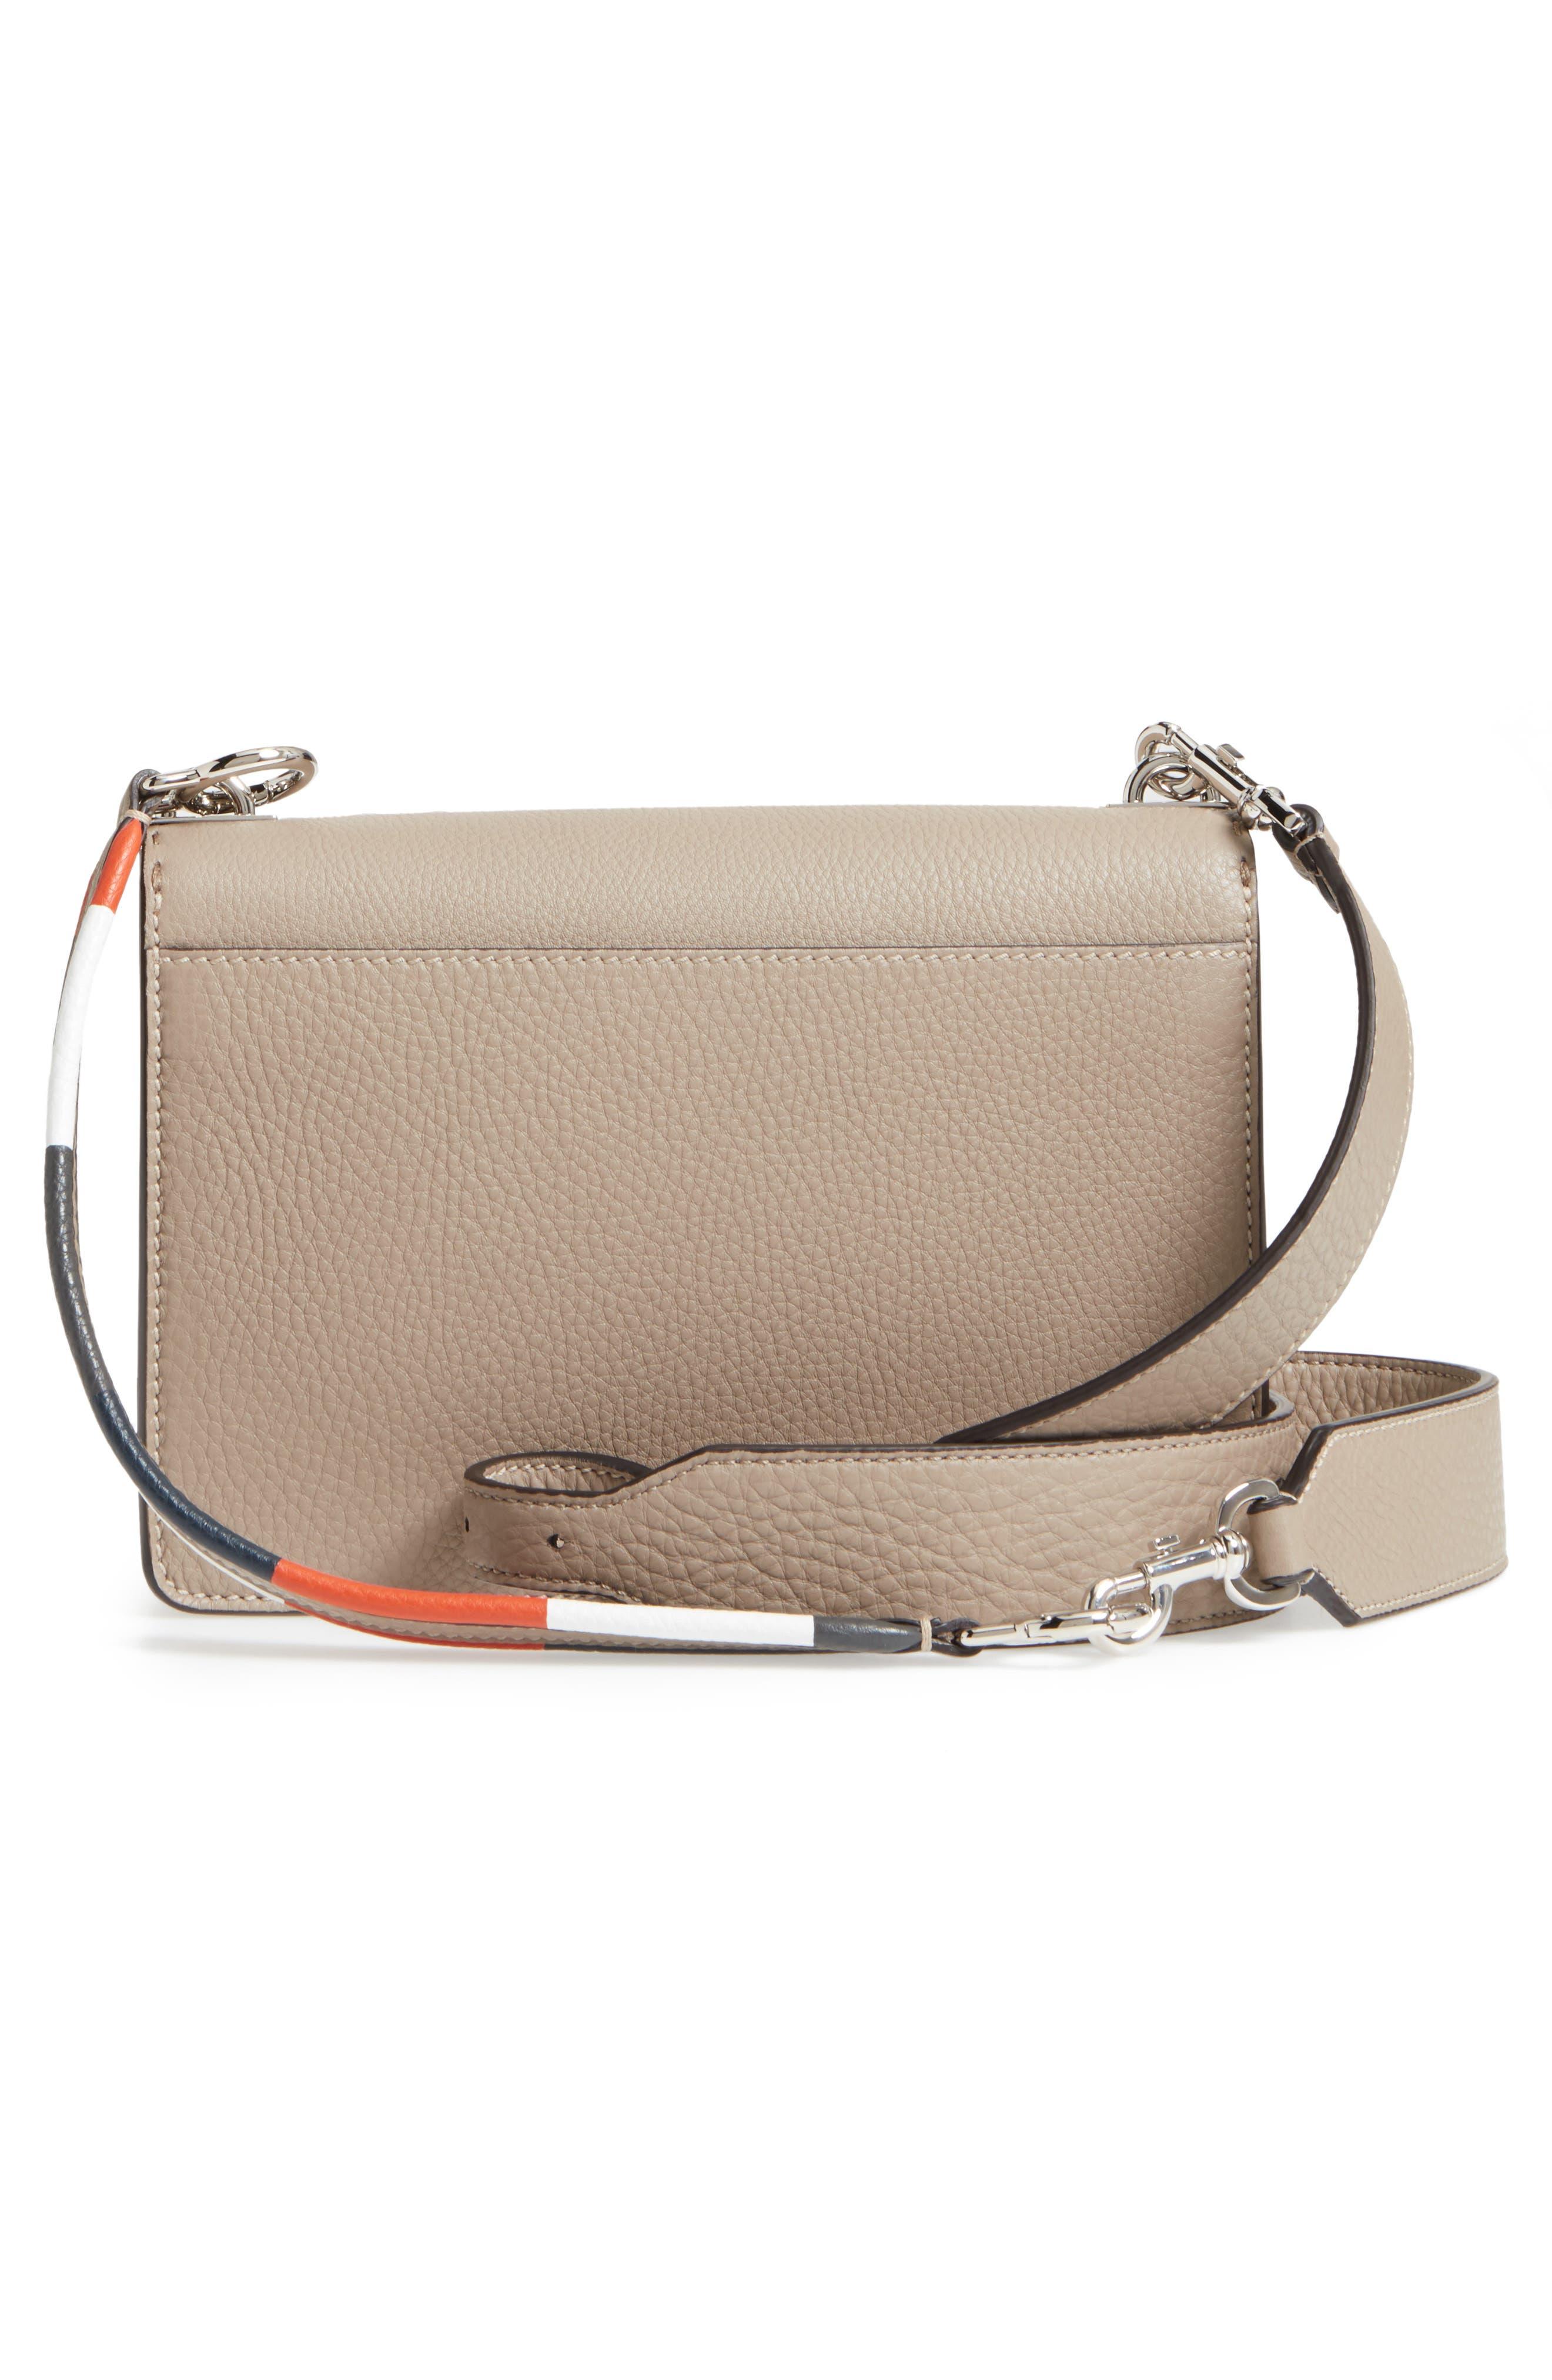 Pebbled Leather Messenger Bag,                             Alternate thumbnail 3, color,                             250